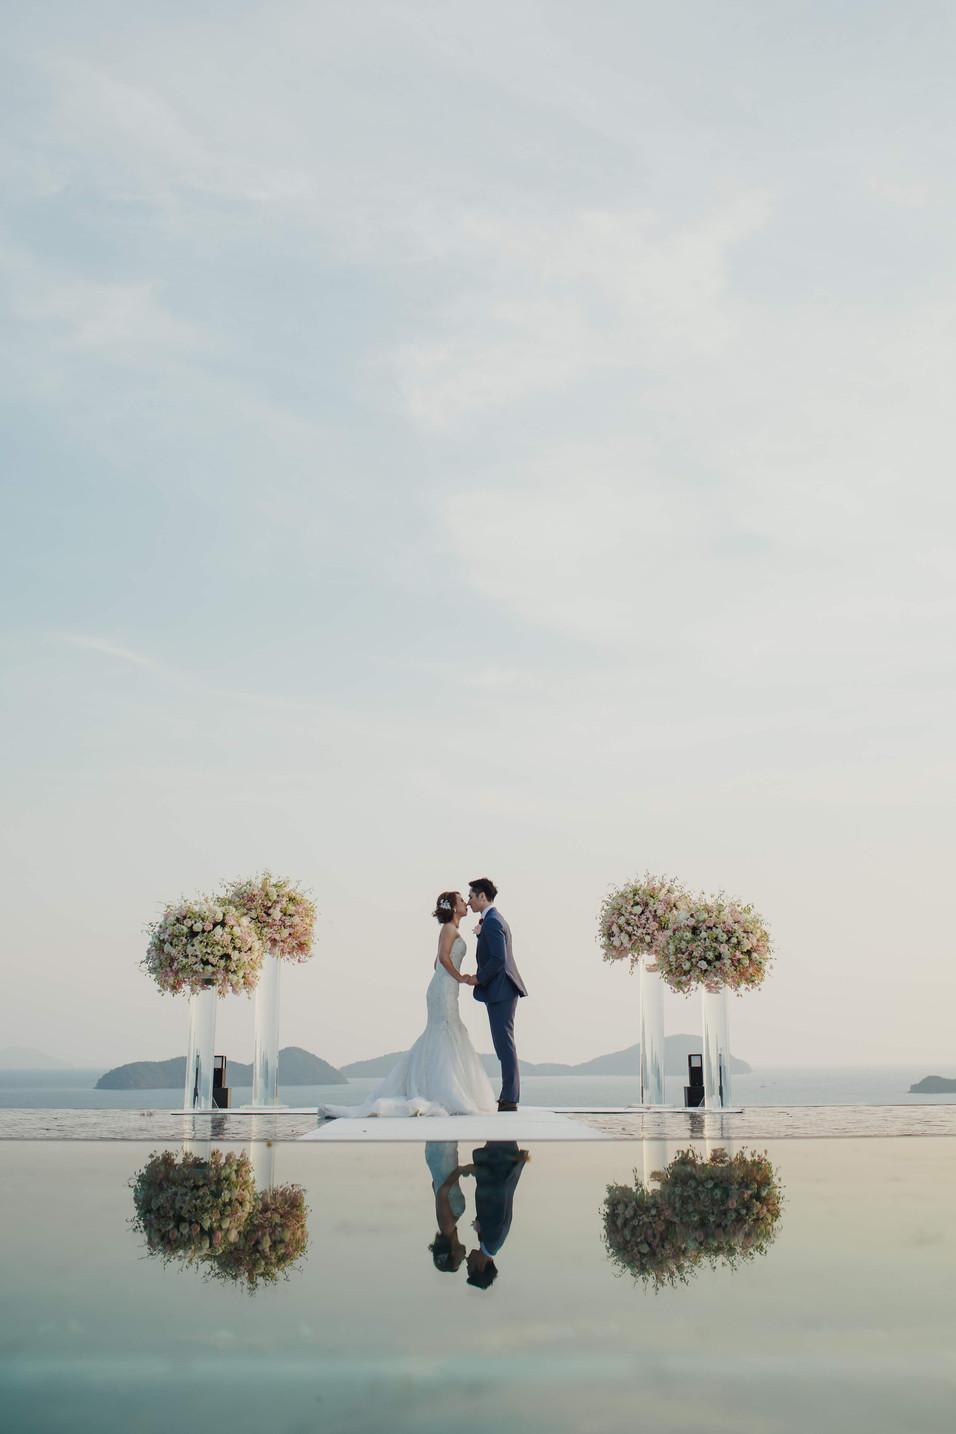 Joey & Hong - Mar 2018